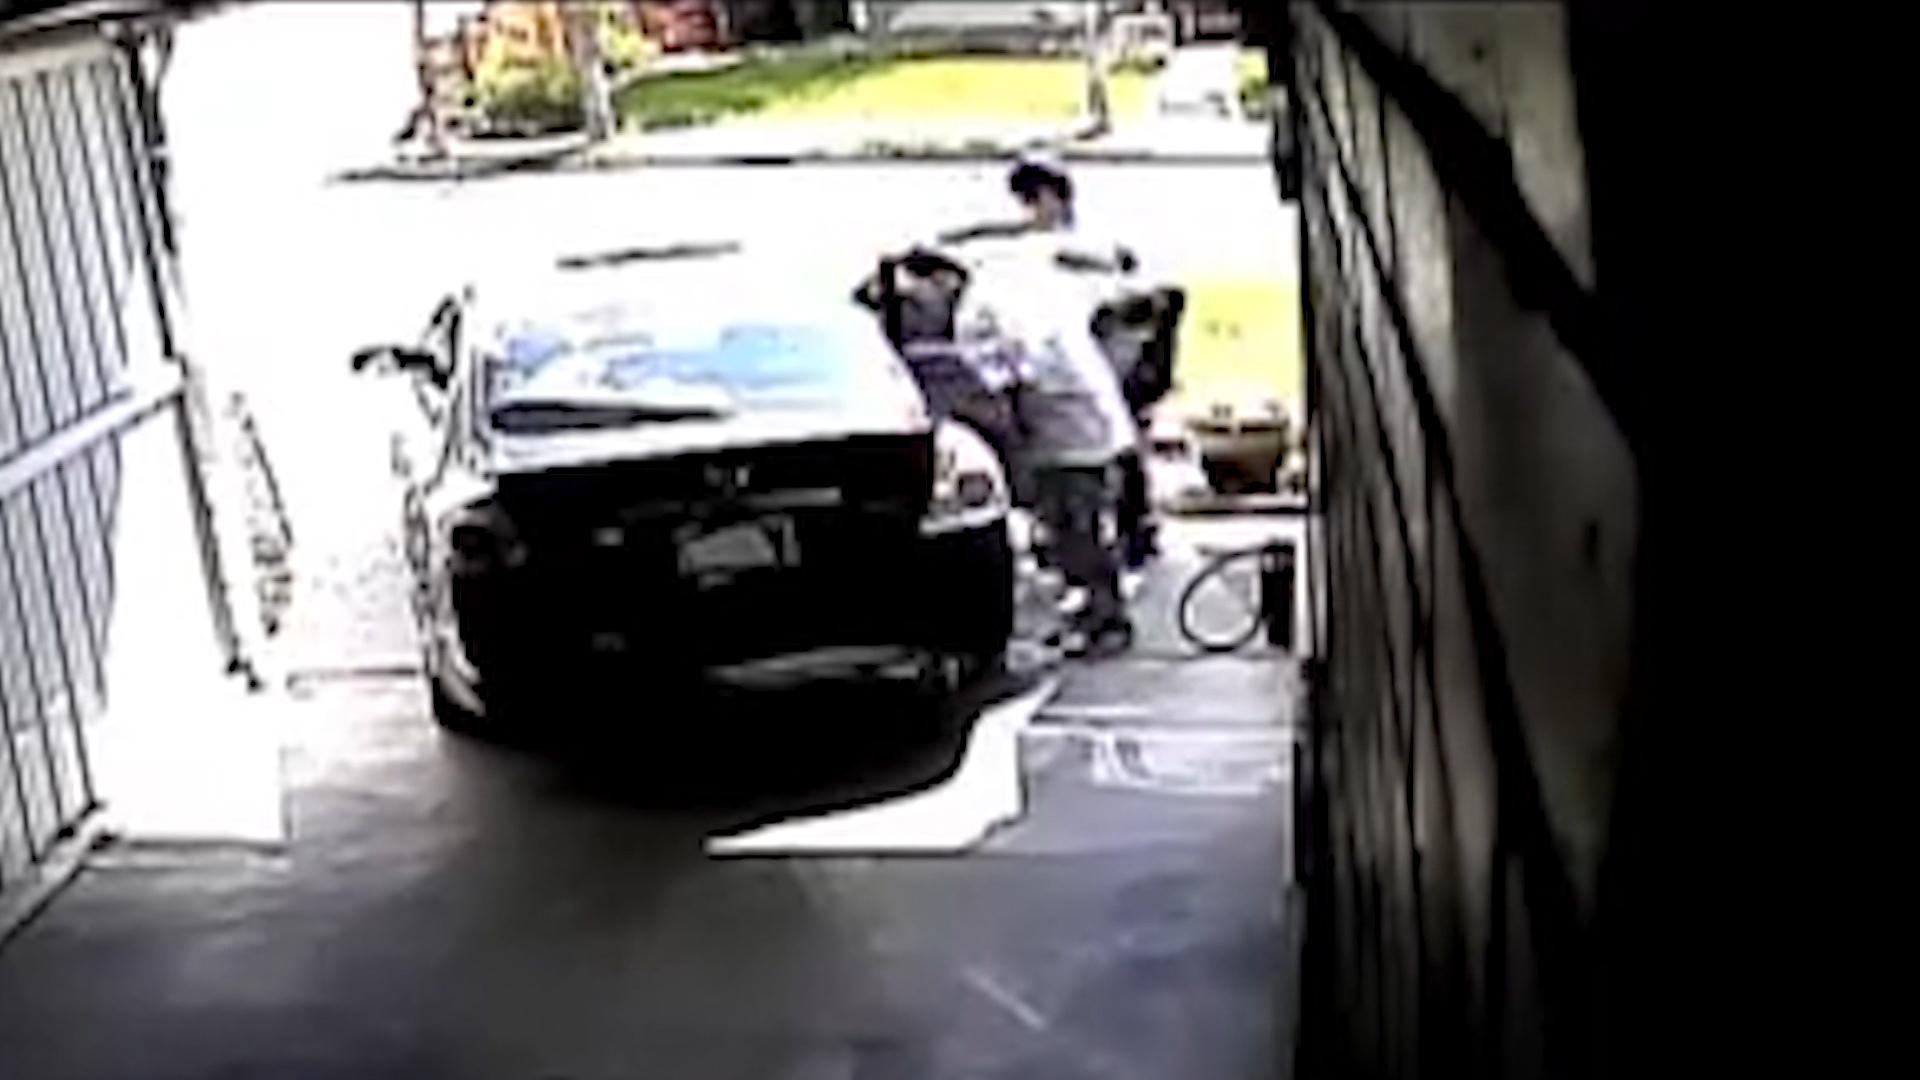 Thieves Caught On Camera Burglarizing Home Ksl Com